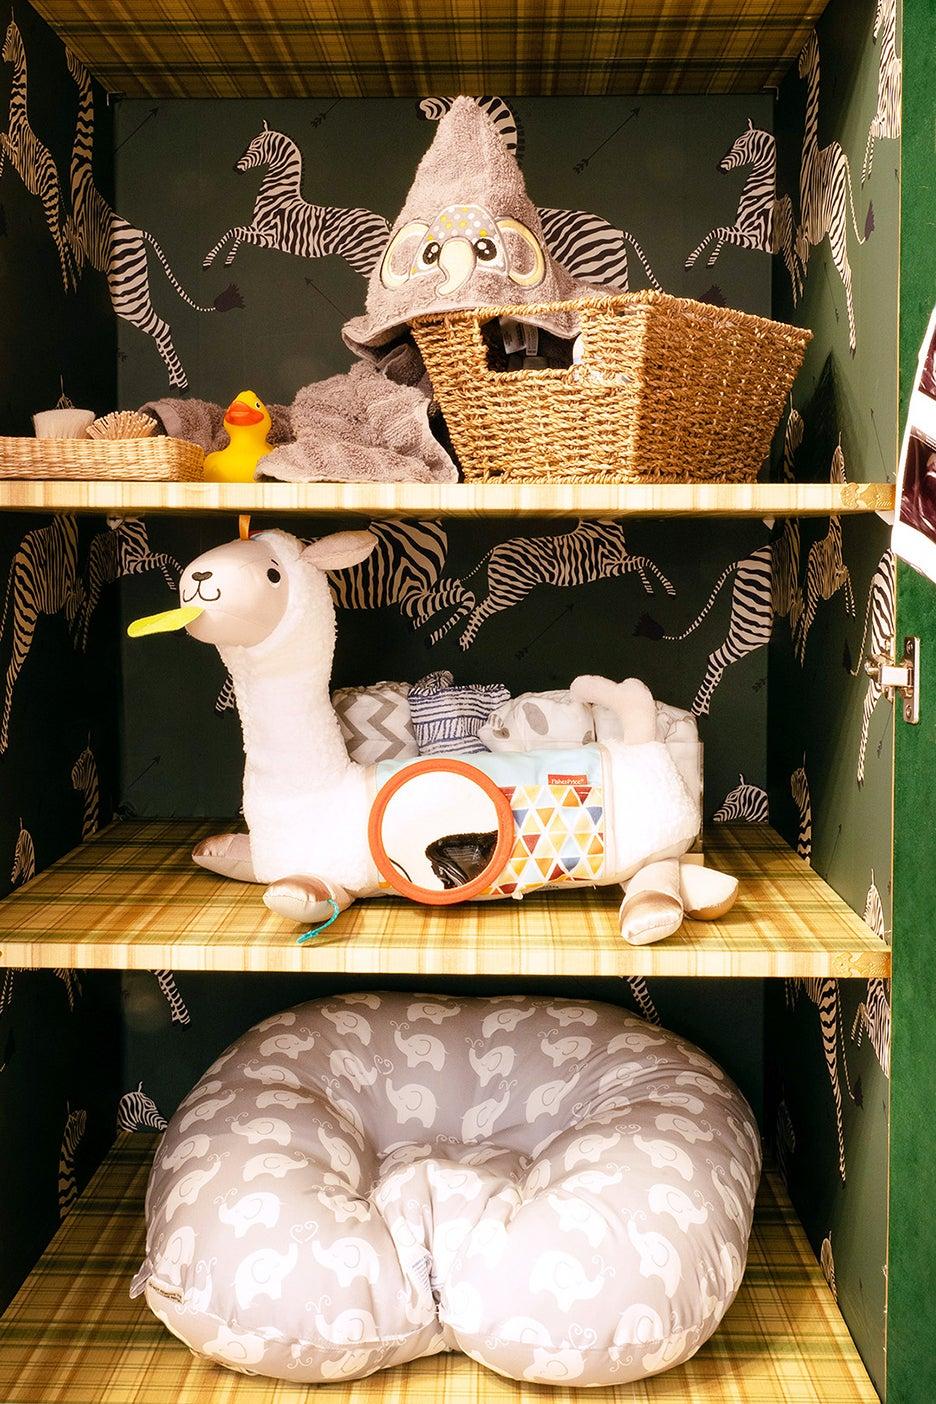 Nursery shelves lined in zebra wallpaper